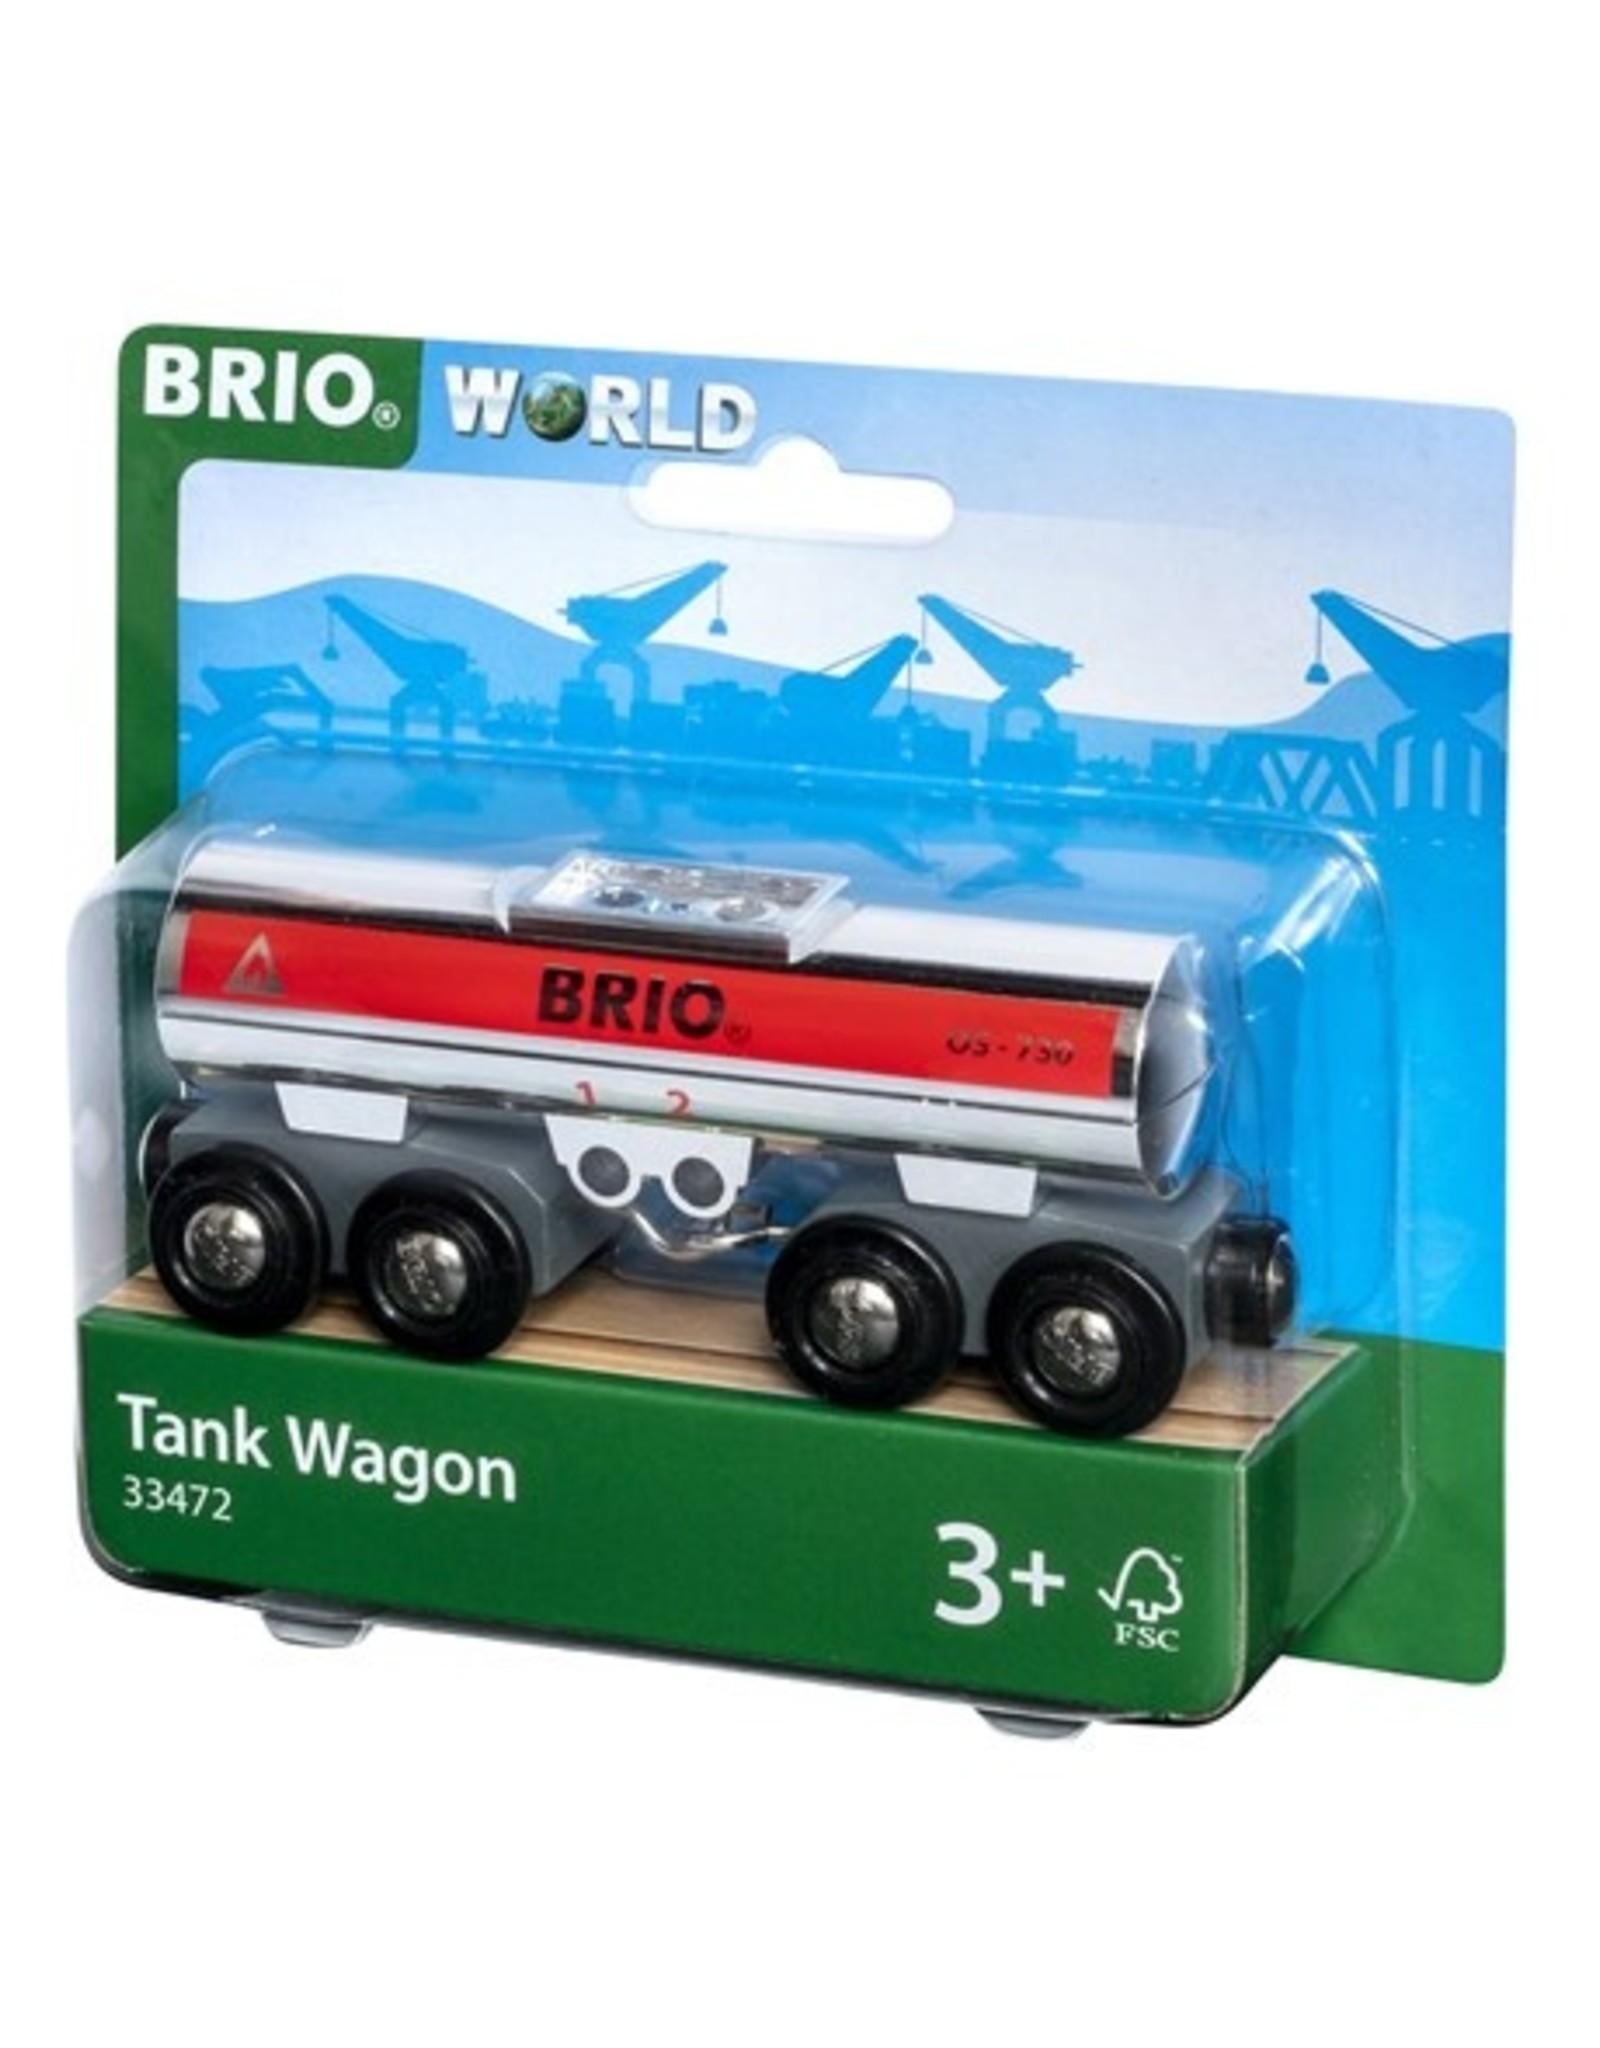 Brio Tank Wagon